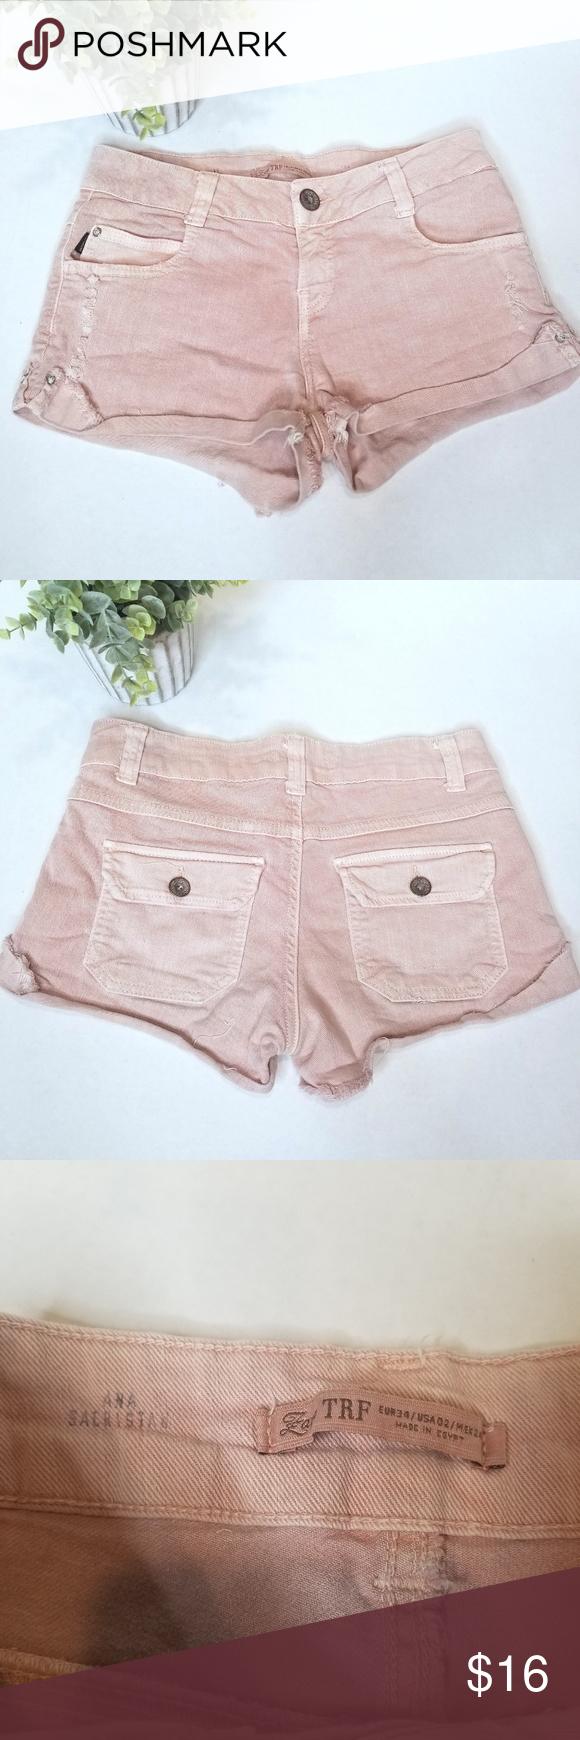 Zara Trf Pink Denim Cutoff Shorts 2 Zara Trafaluc Pink Denim Cutoff Shorts. Size 2.  Good Condition.   Waist 13.5 Hips 16 Inseam 1 3/4 Rise 7 3/4 Front Length 8.5 Back Length 10.5 Zara Shorts Jean Shorts #denimcutoffshorts Zara Trf Pink Denim Cutoff Shorts 2 Zara Trafaluc Pink Denim Cutoff Shorts. Size 2.  Good Condition.   Waist 13.5 Hips 16 Inseam 1 3/4 Rise 7 3/4 Front Length 8.5 Back Length 10.5 Zara Shorts Jean Shorts #denimcutoffshorts Zara Trf Pink Denim Cutoff Shorts 2 Zara Trafalu #denimcutoffshorts